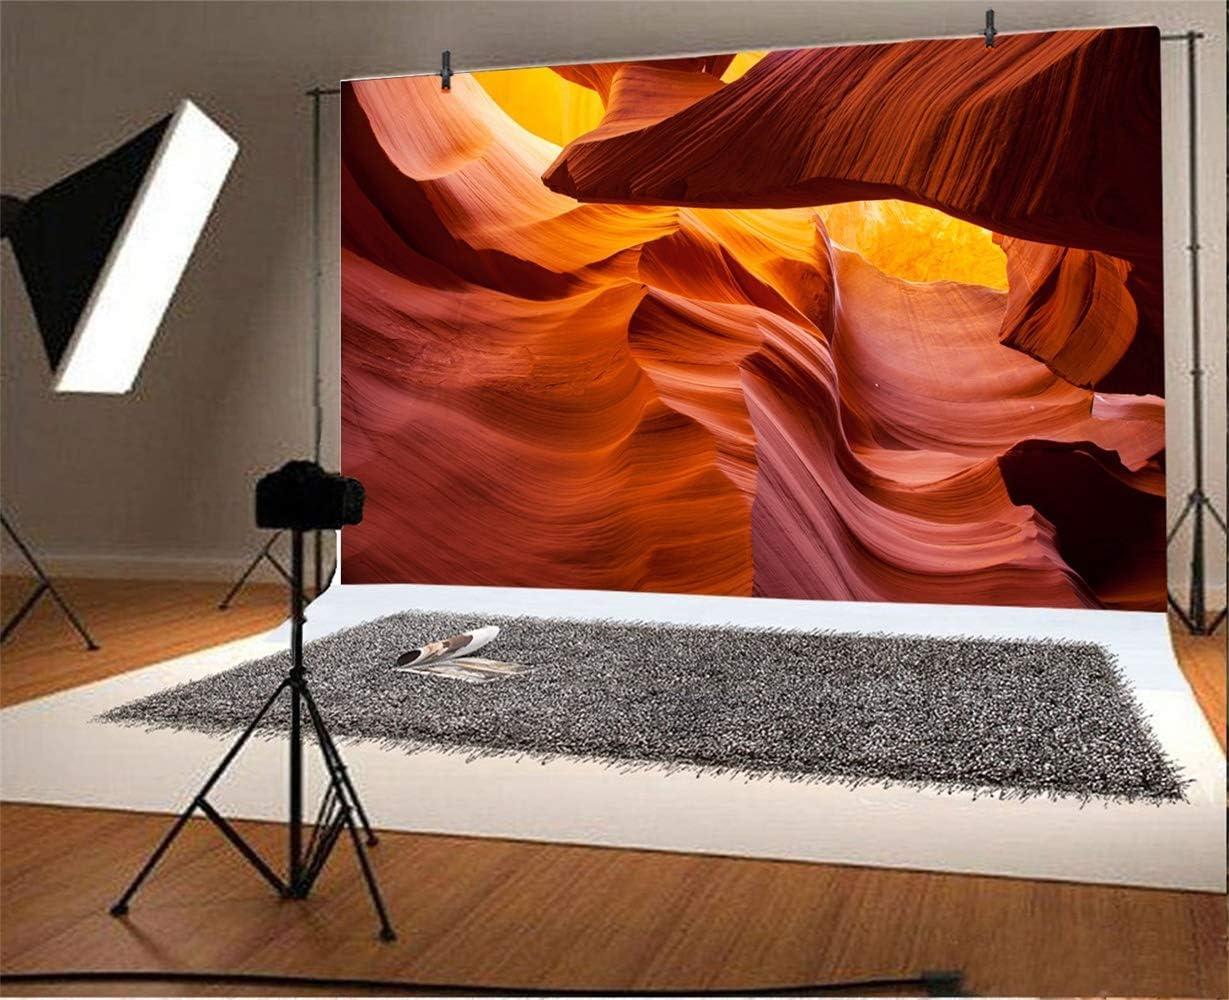 10x7ft Solitude Weathered Canyon Sandstones Upward View Background for Photography Arizona Geologic Nature Scenery Backdrop Indoor Decoration Landscape Wallpaper Studio